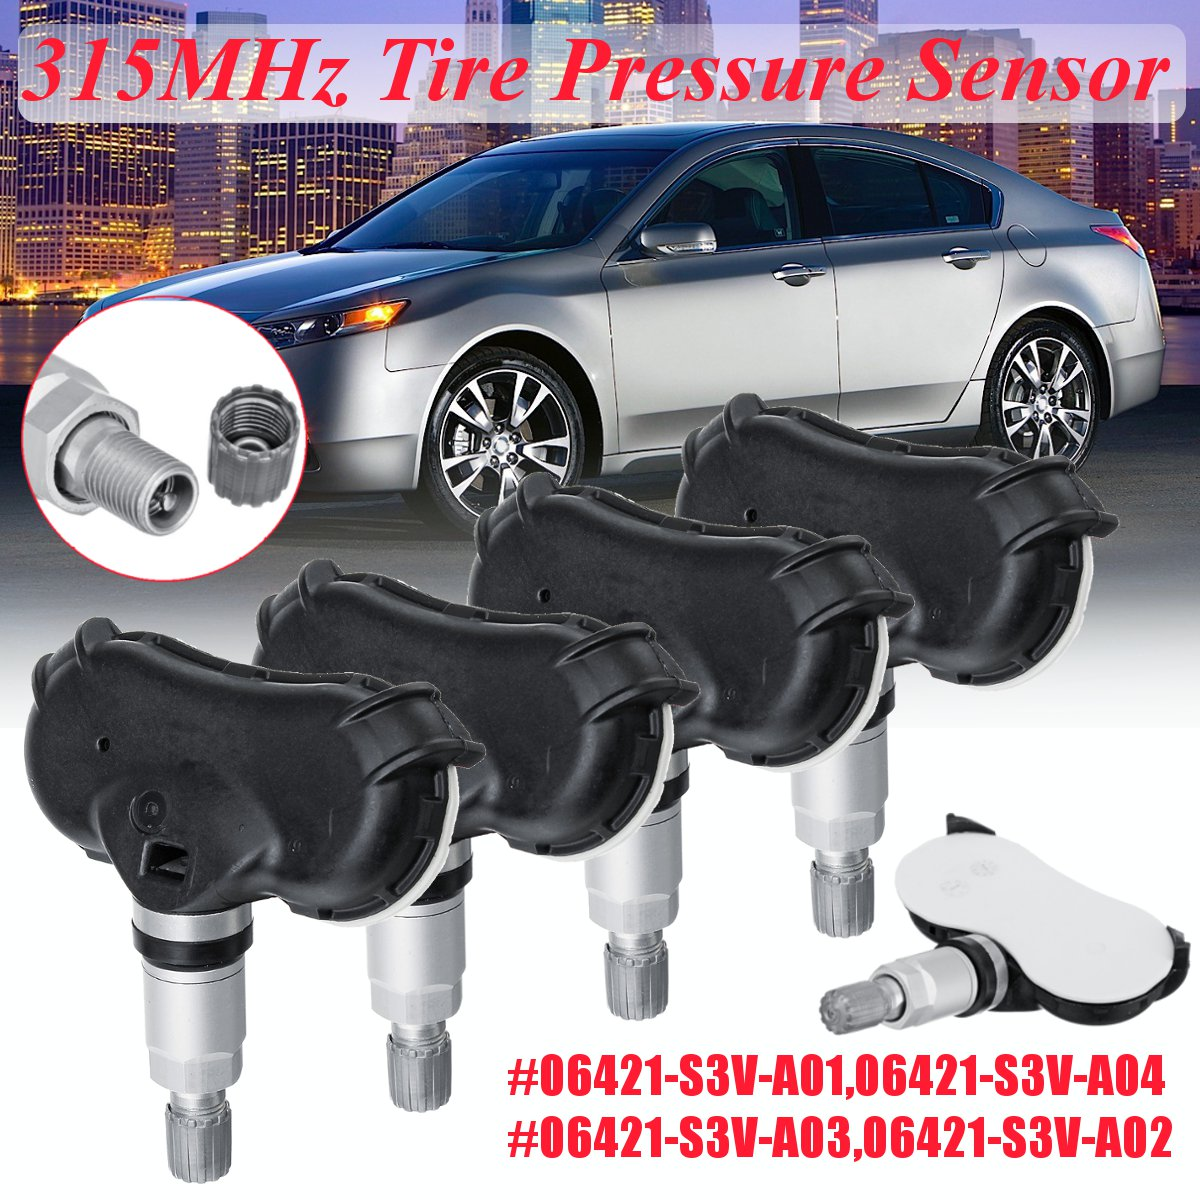 315MHz OEM Tire Pressure Monitor Sensor TPMS Honda Odyssey Ridgeline Pilot Acura